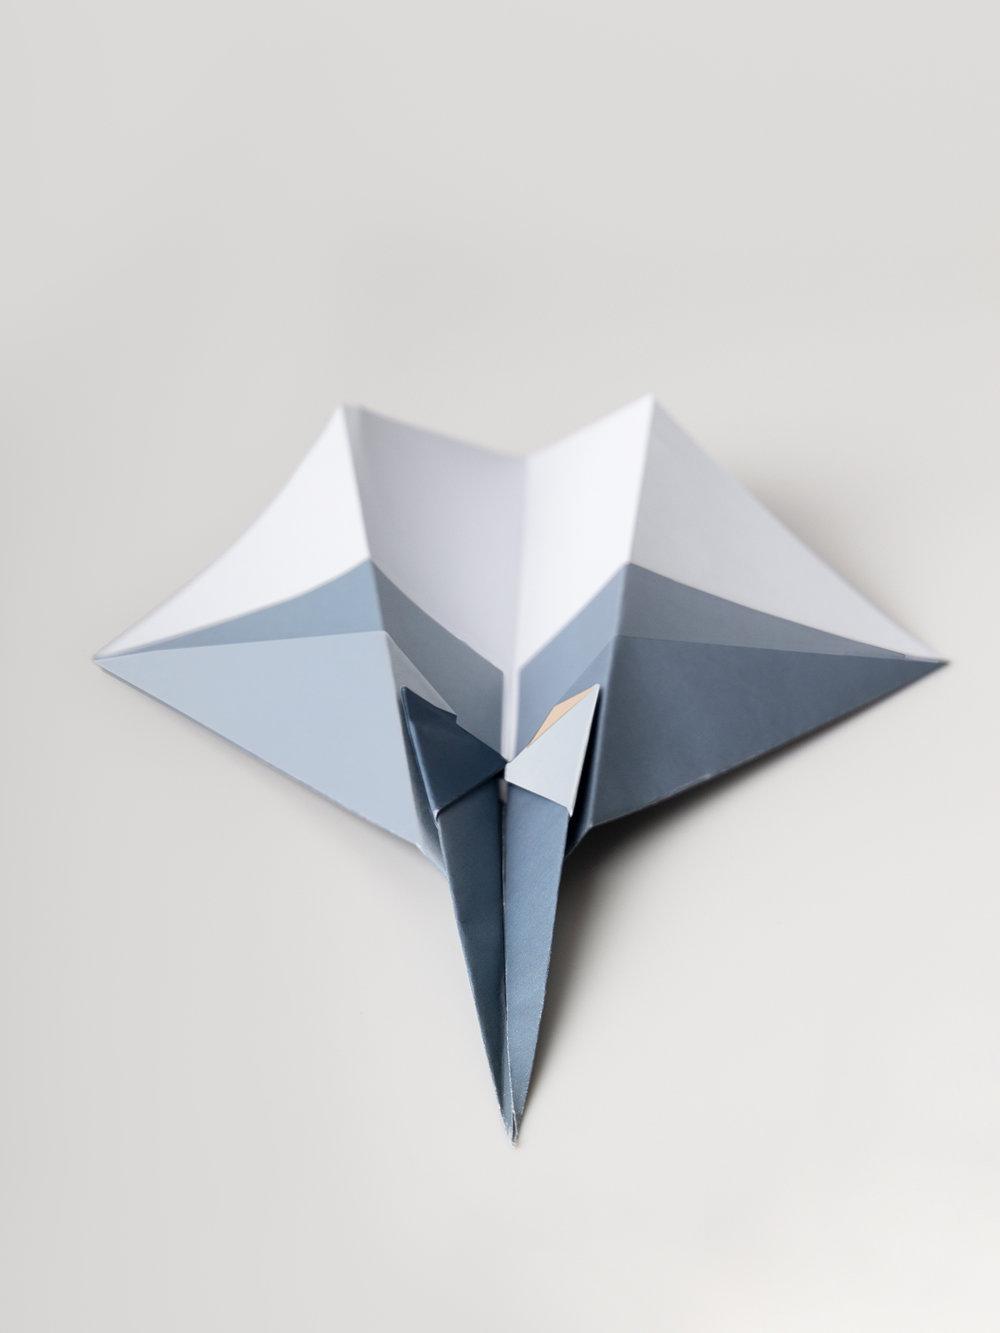 Origami  Figur Papierdüsenflieger, mehrfarbig  Origami figure Paperjet, multicolored